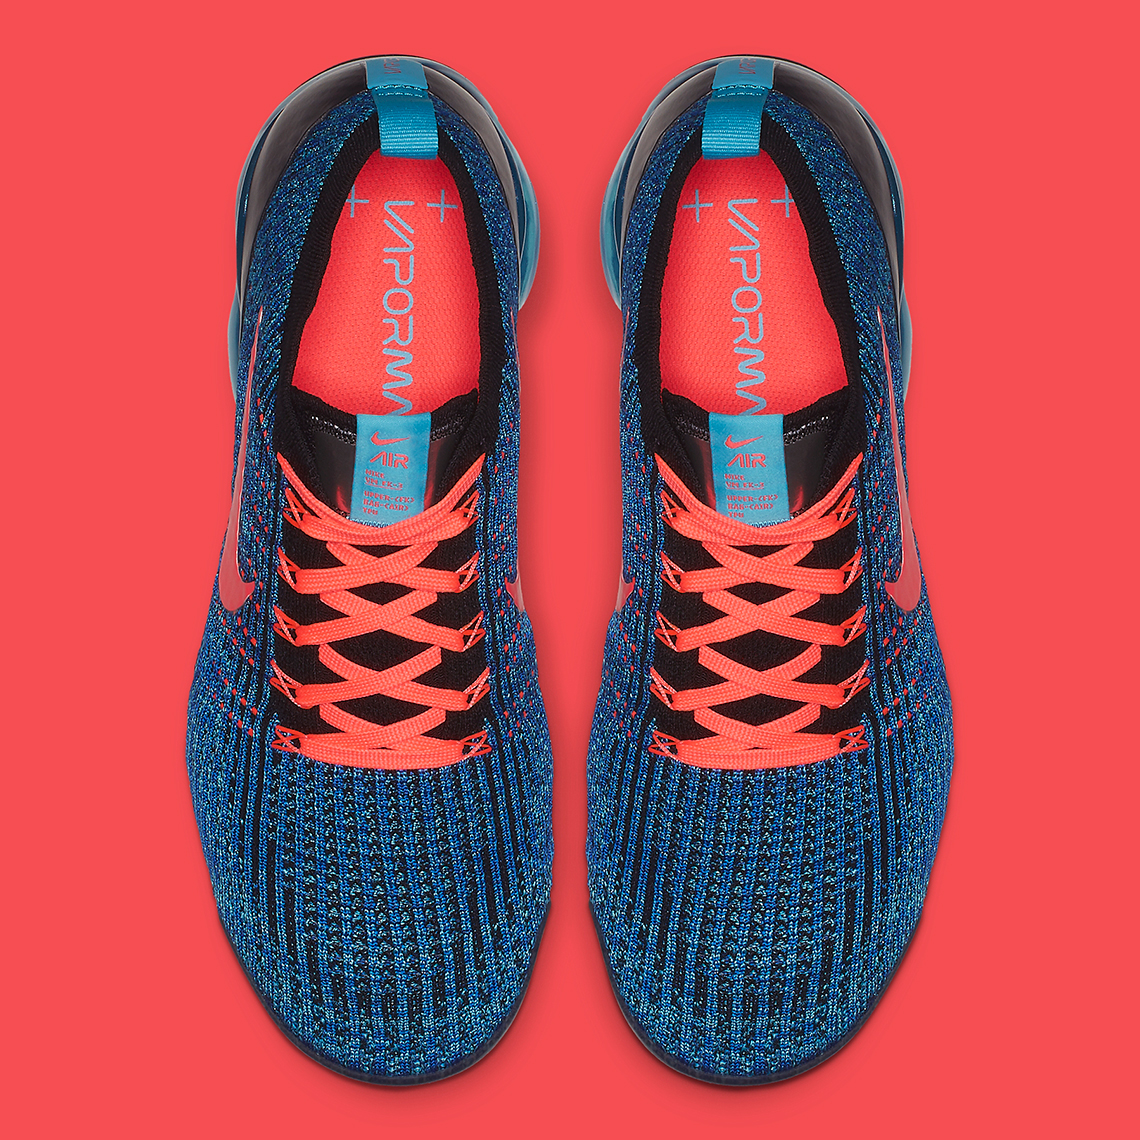 0a62346441c Nike Vapormax Flyknit 3.0 Blue Fury AJ6900-401 Store List ...